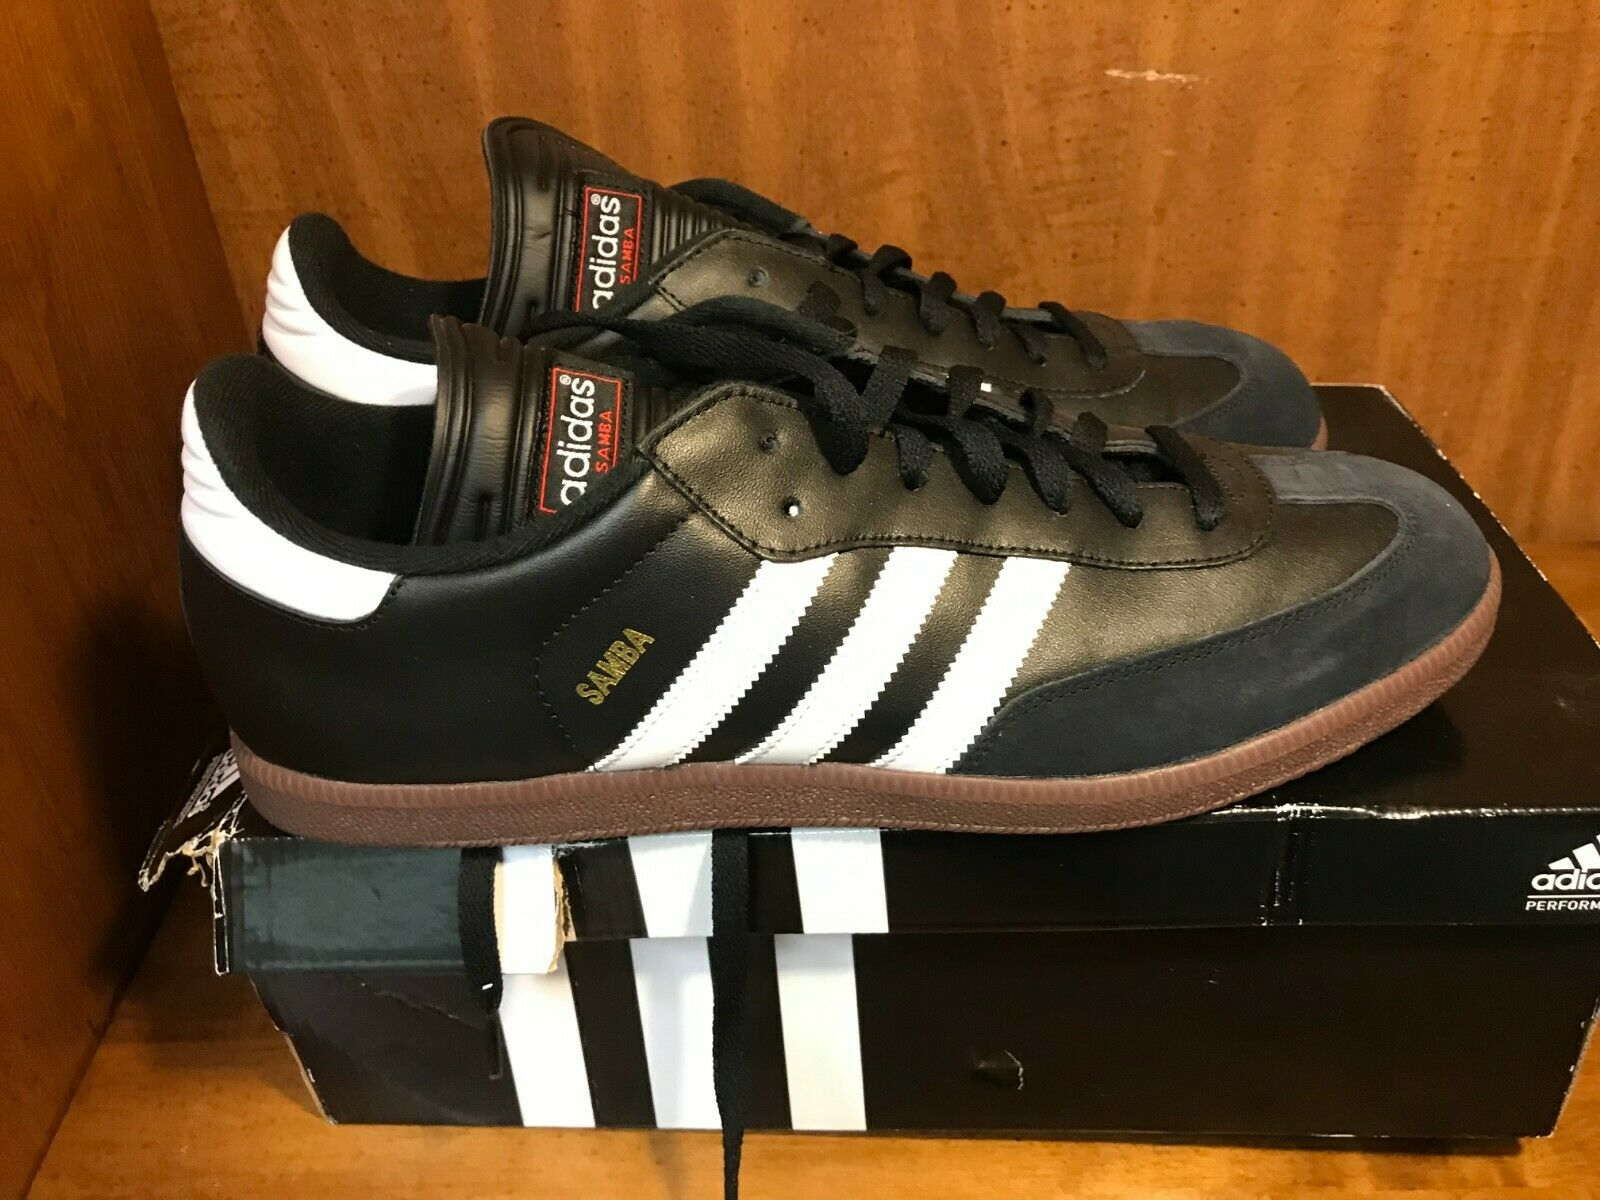 Men's Adidas Samba Black White Sz. 13.5 NEW WITH BOX